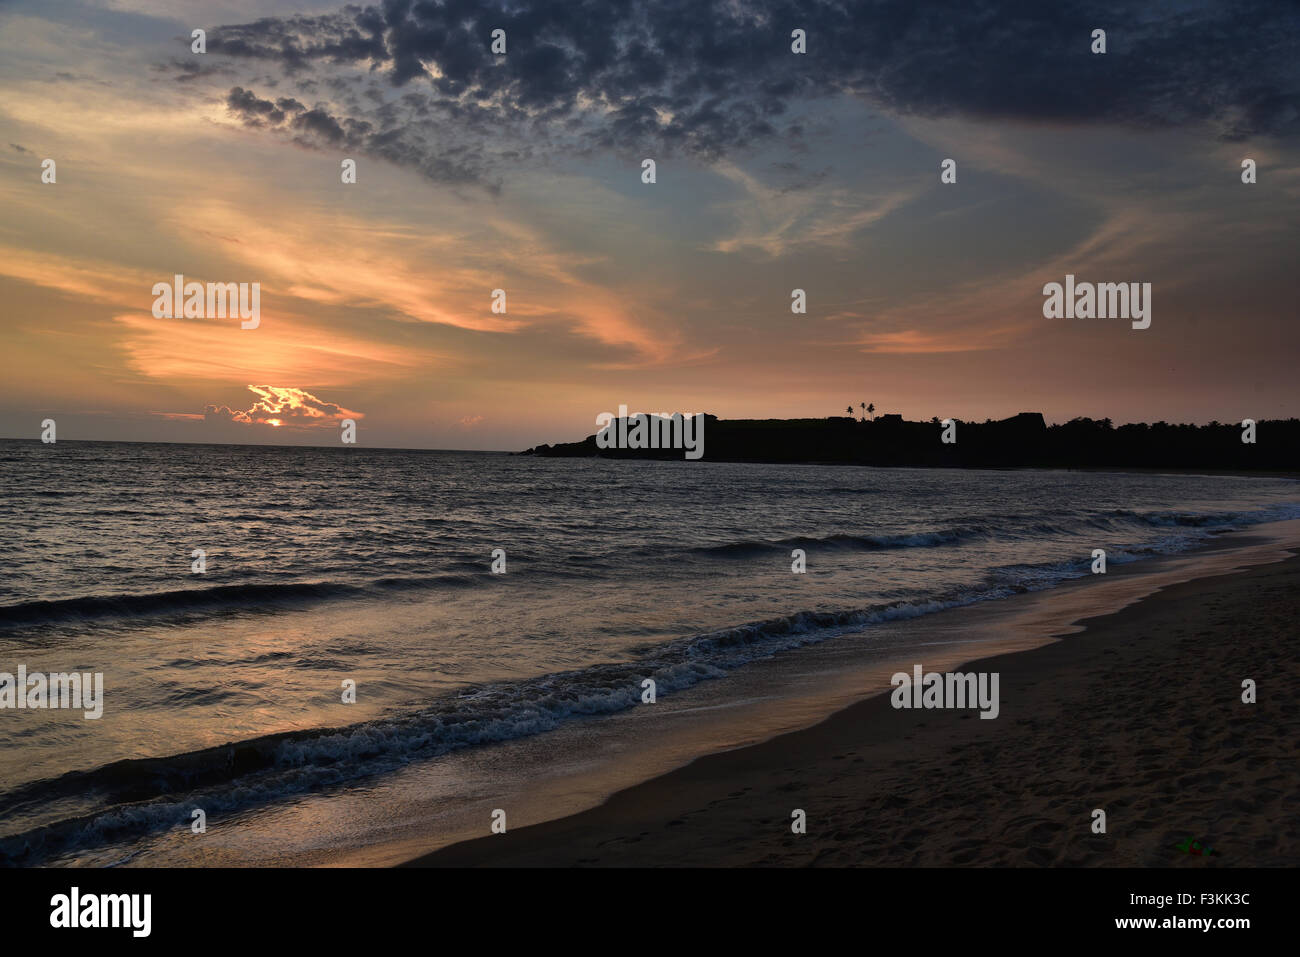 Sunset over ocean and beach in Kerala India.Bekal fort beach Kasargode.Beach,cloud,flat,horizon,india,indian,kerala,ocean,reflec - Stock Image